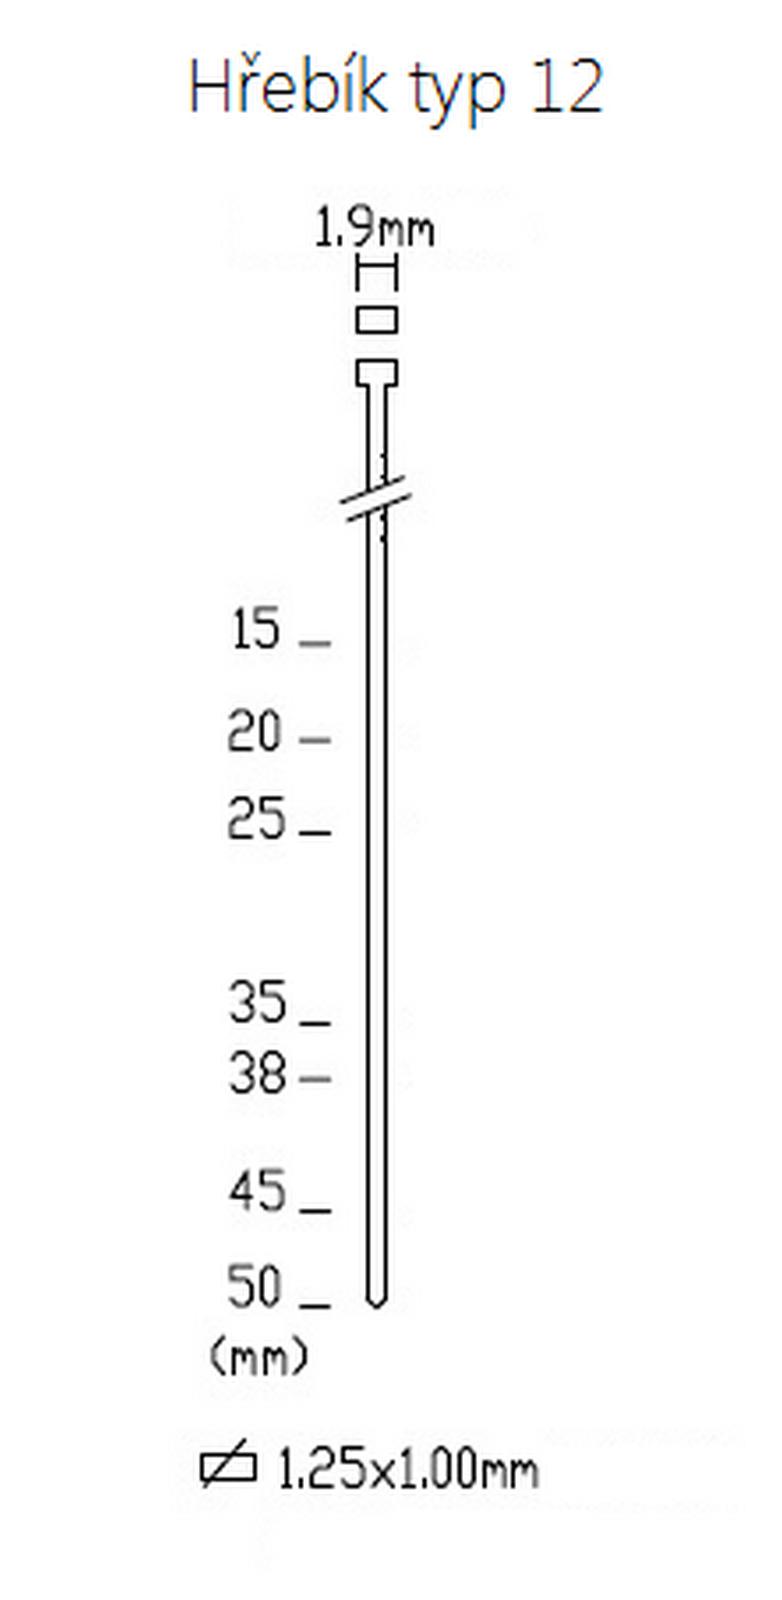 Hřebík Typ 12/15 - 5 000ks -